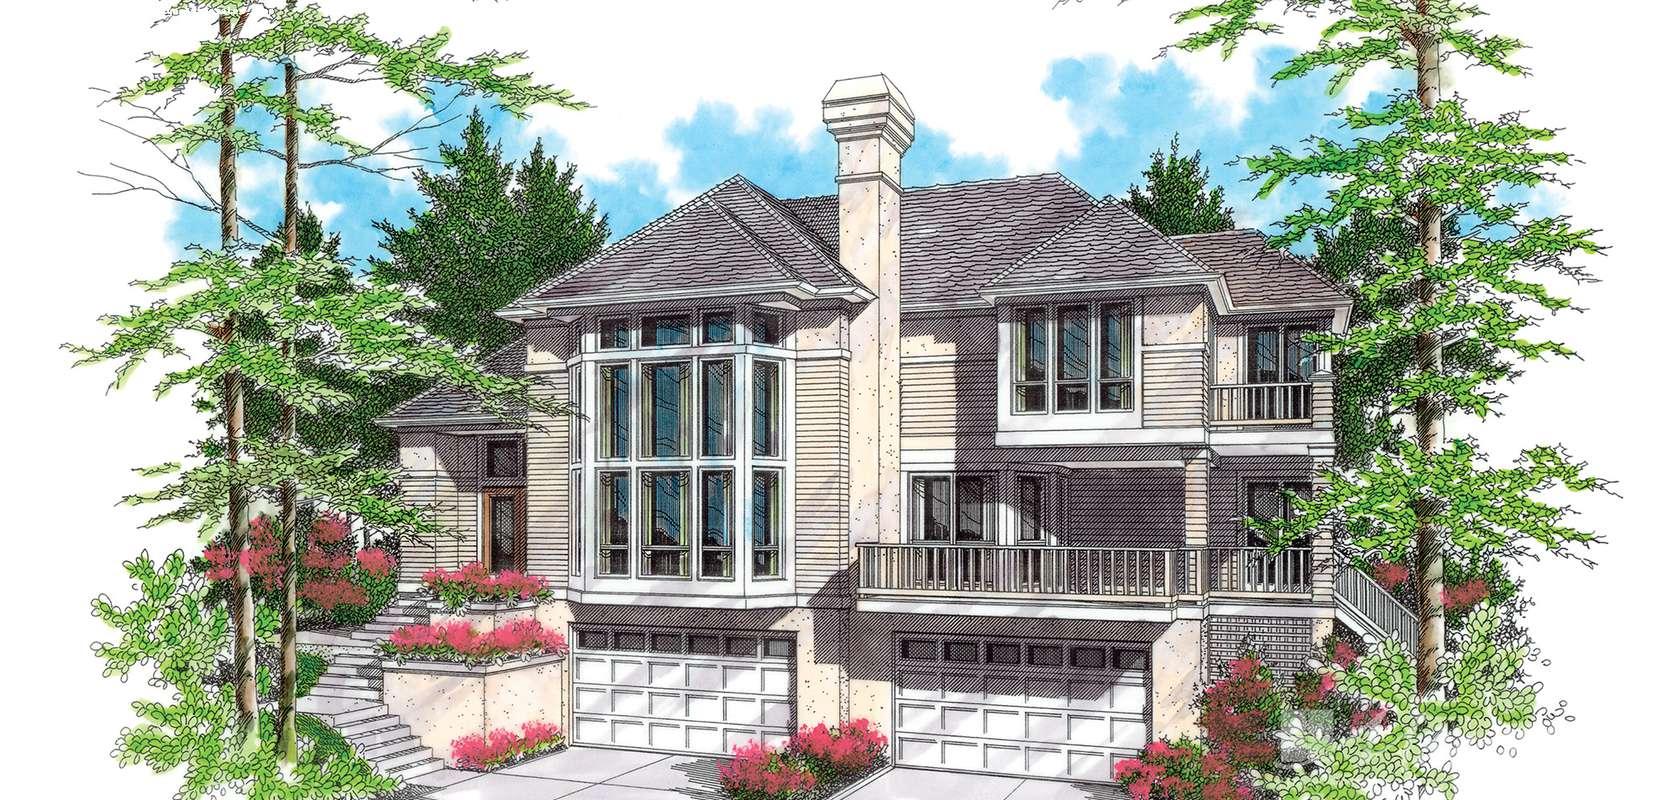 Mascord House Plan 22105: The Ridgecrest